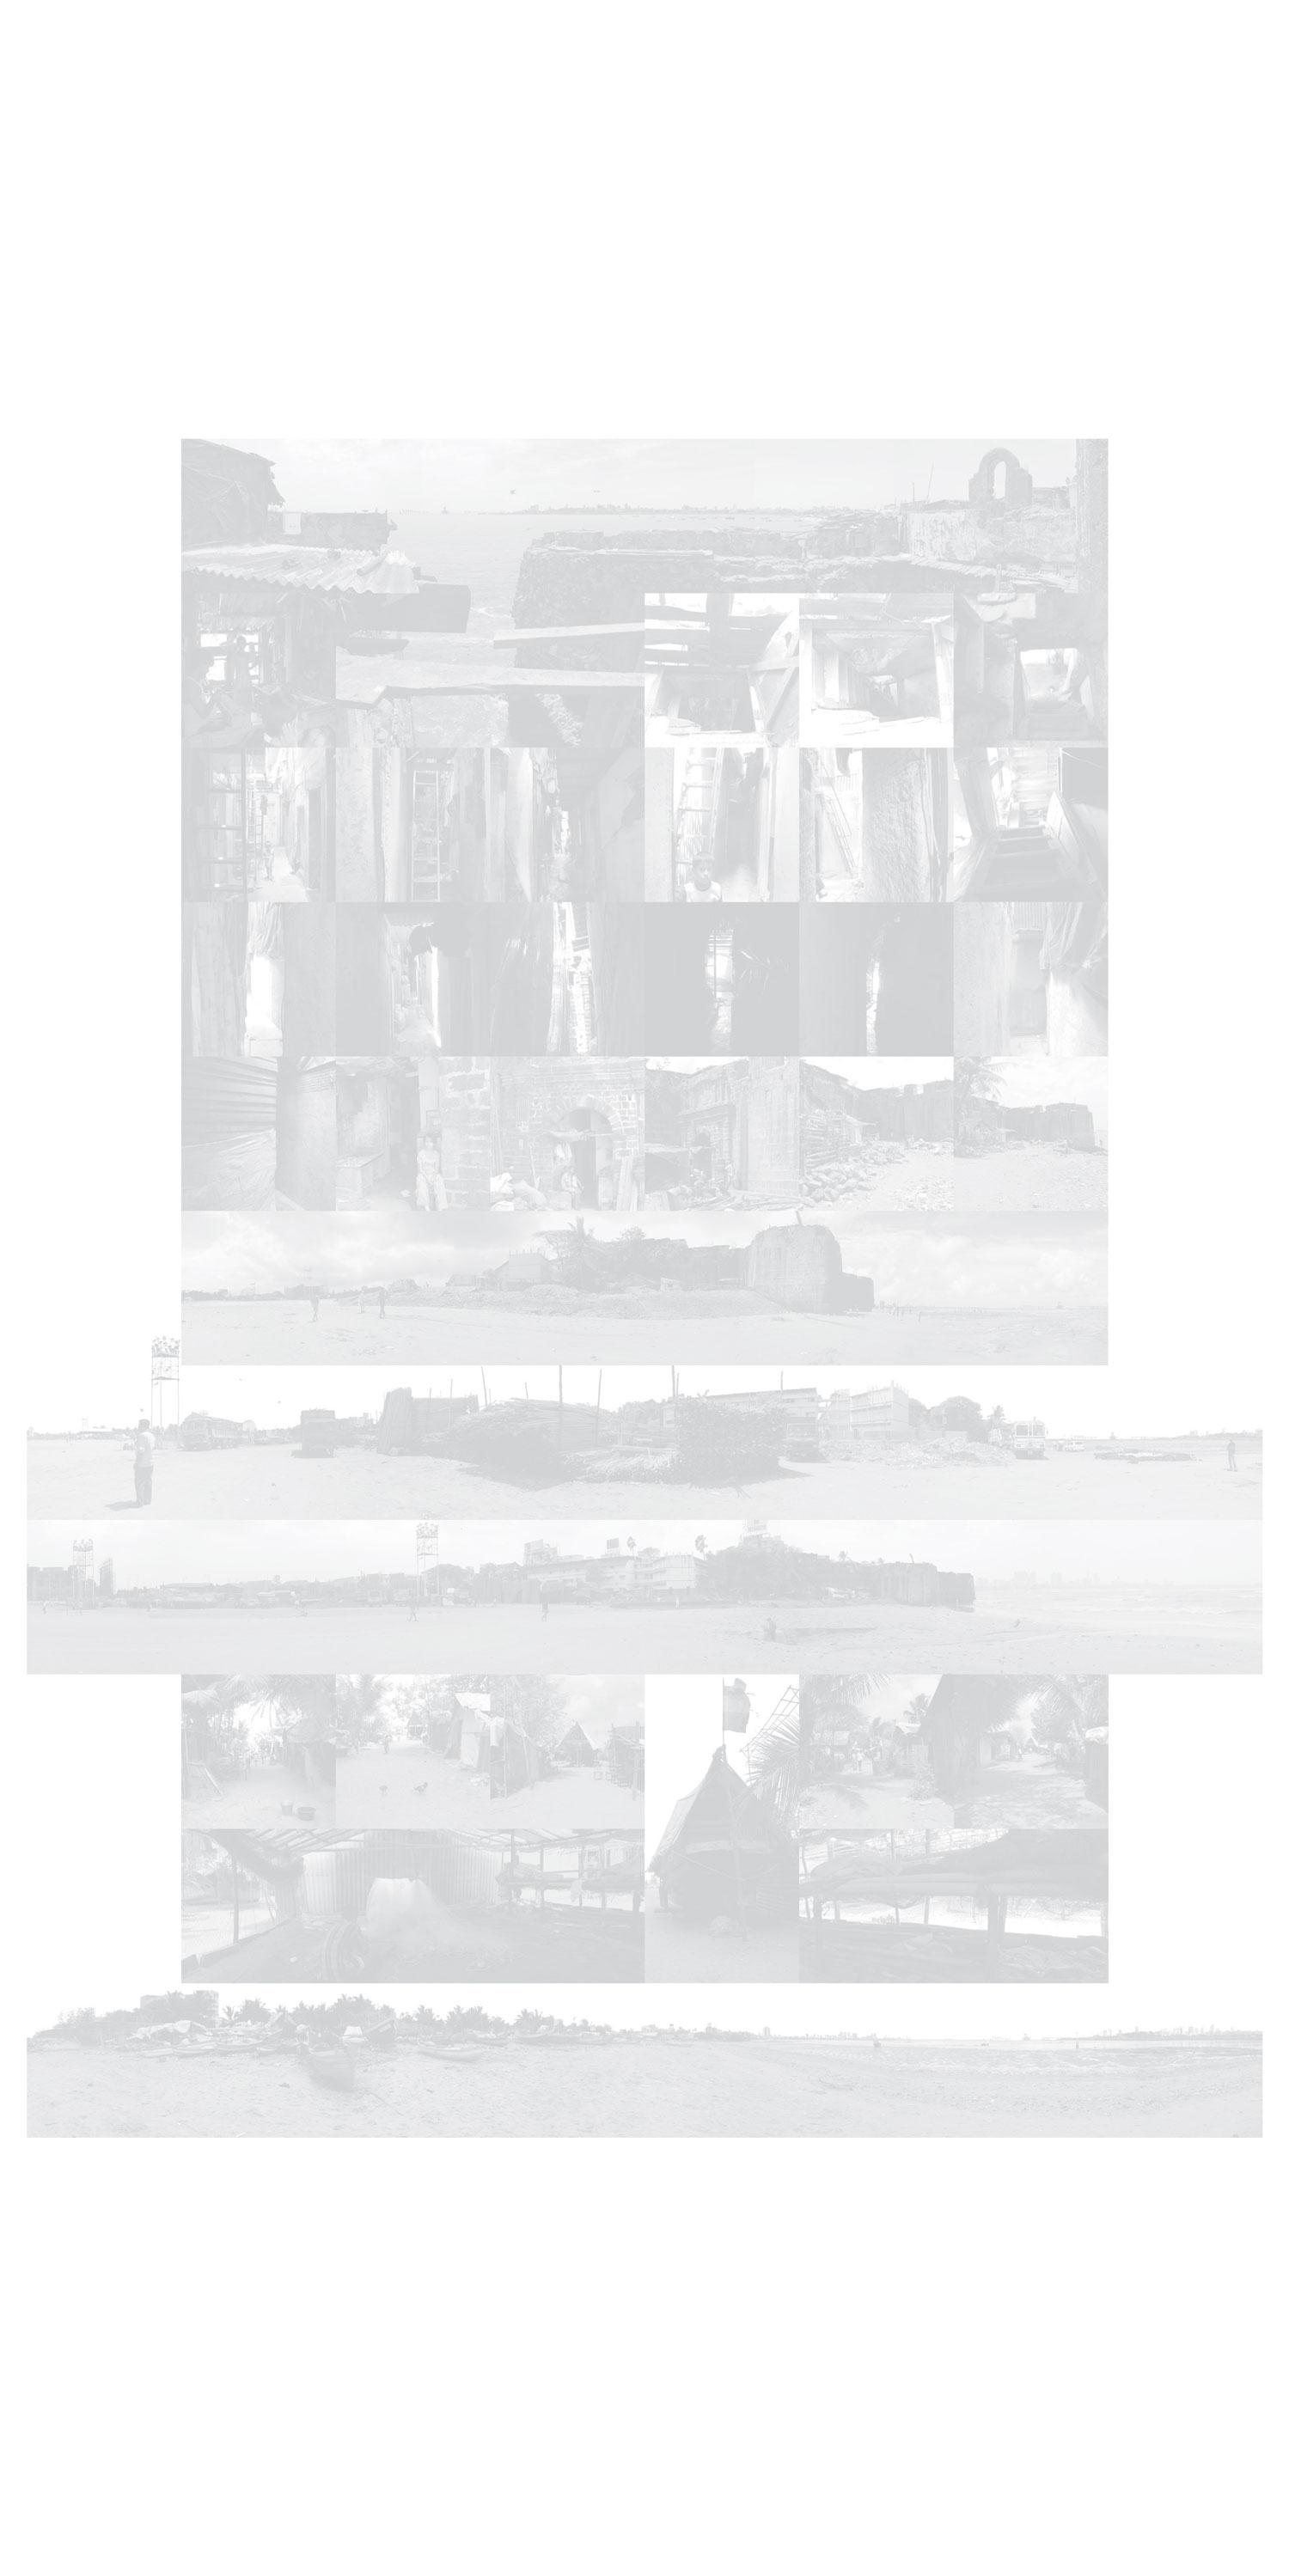 01_mahim-fort-faded-photowork.jpg